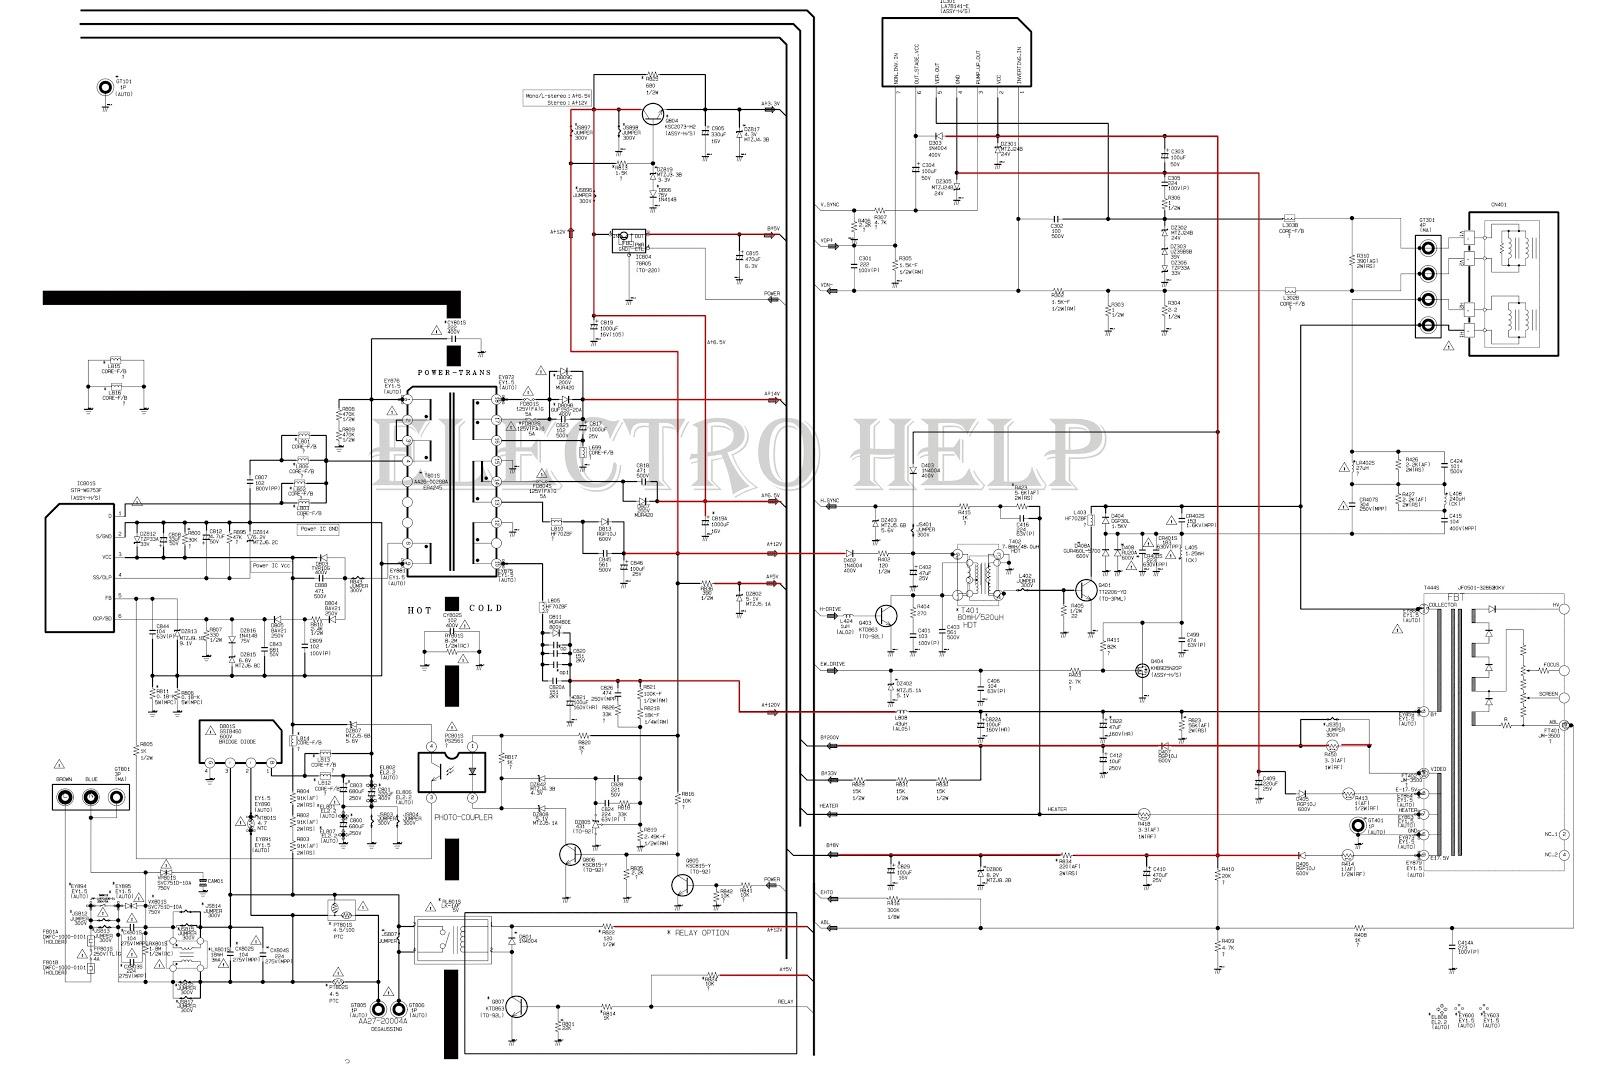 Cl21a551 Samsung Crt Tv Circuit Diagram Tda H Smd